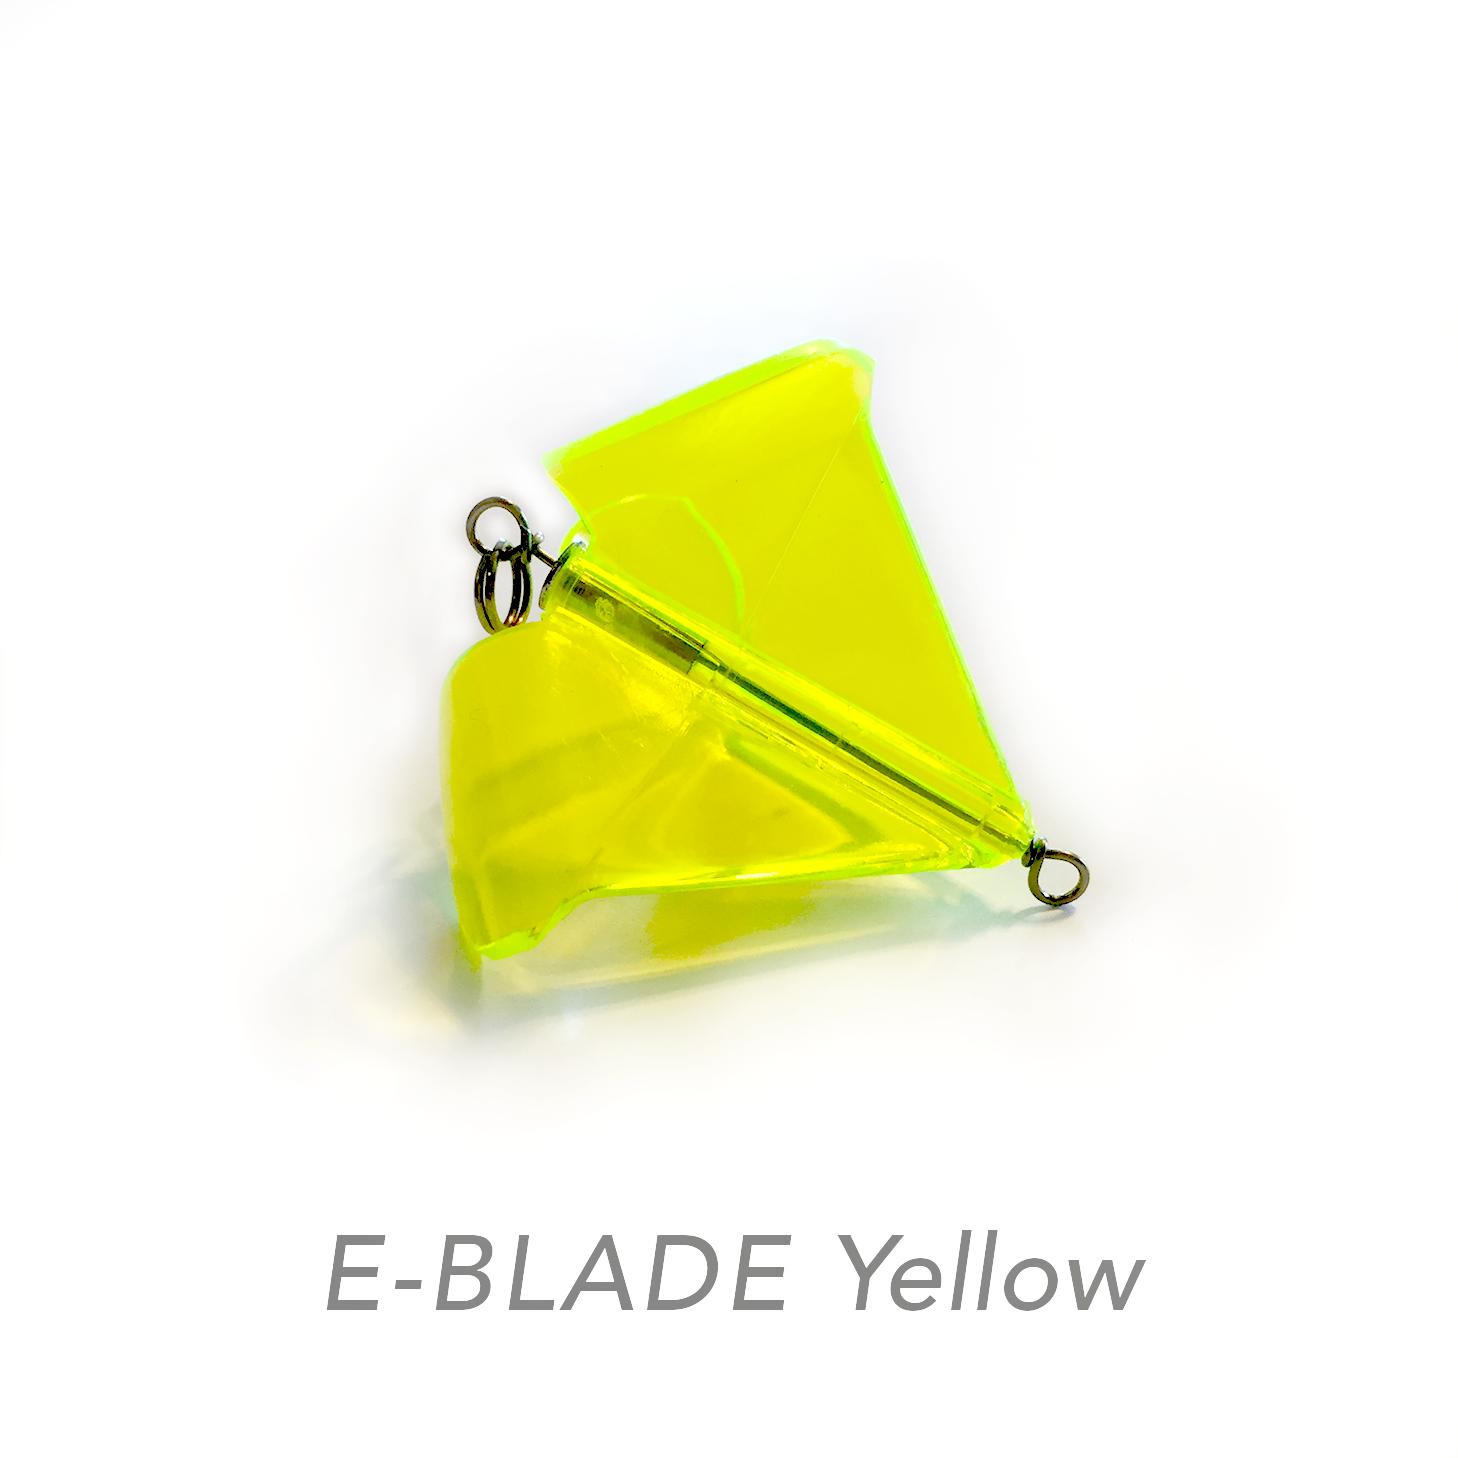 eblade-yellow.png